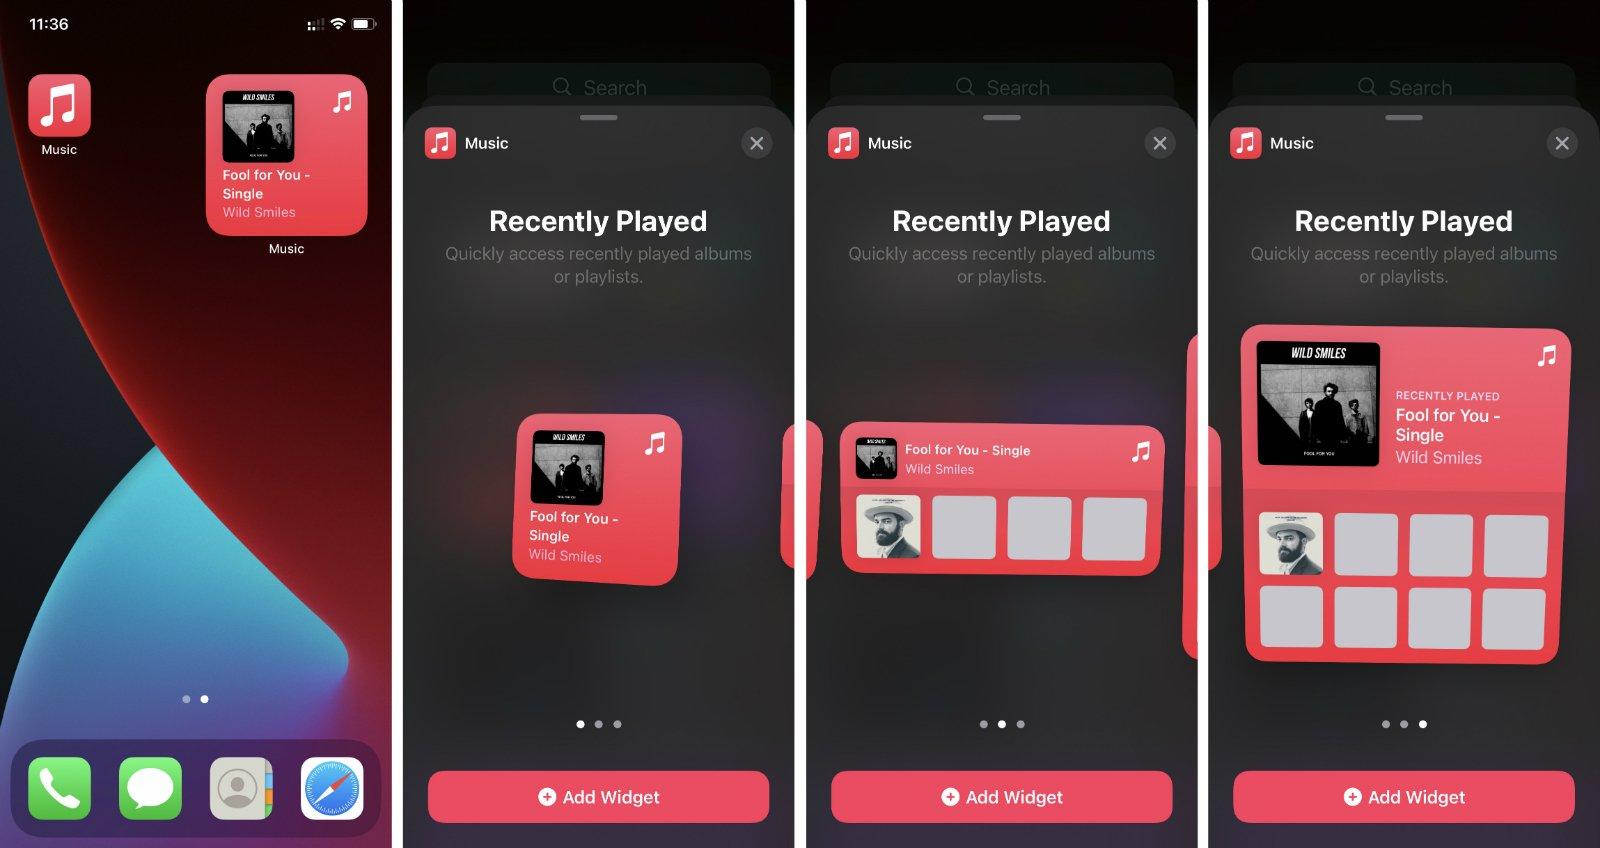 iOS 14 2 بررسی iOS 14؛ نه آنقدر هیجانانگیز که تصور میکردید [تماشا کنید] اخبار IT